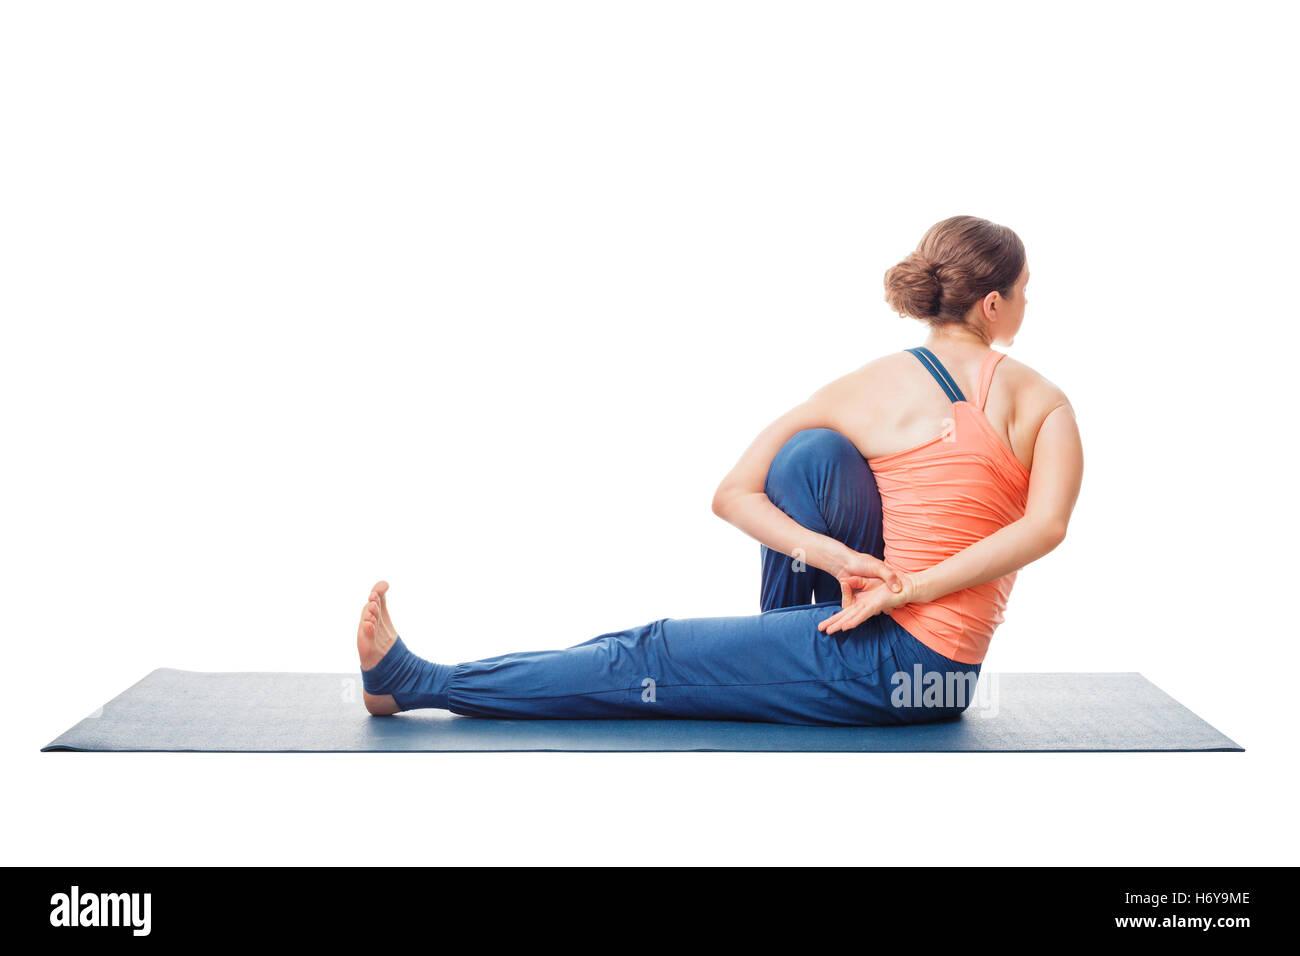 Woman Doing Ashtanga Vinyasa Yoga Asana Marichyasana C